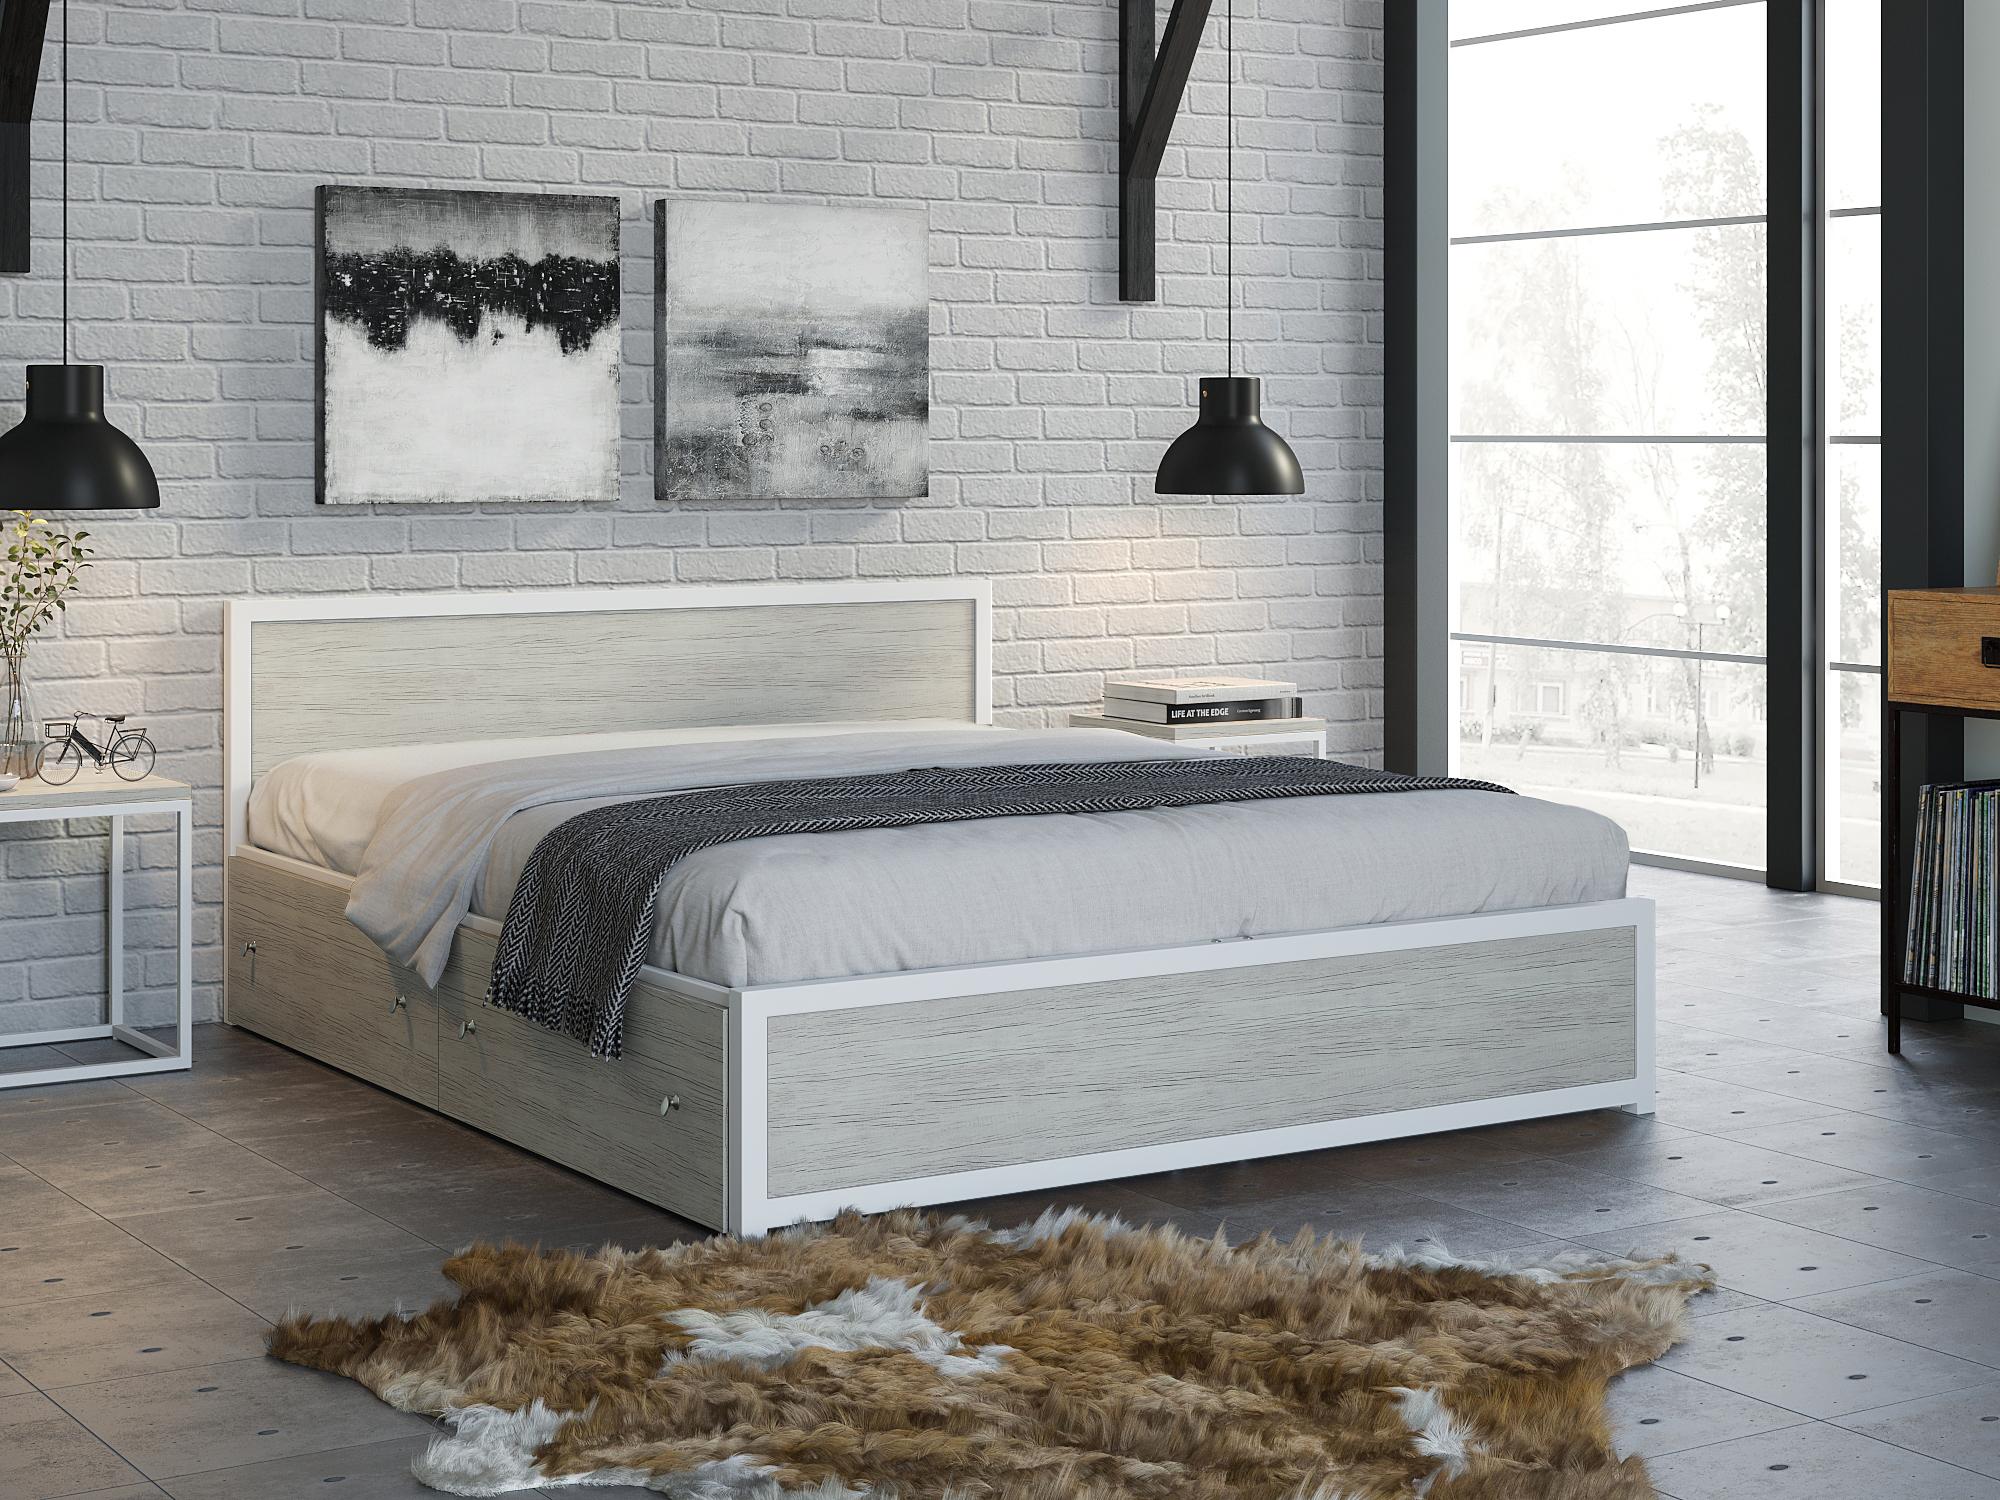 Фото - Кровать Титан (160х200) Дуб крафт белый, Белый, ЛДСП 26 мм, Металл крафт роберт эмиль воздушный пират икс металл